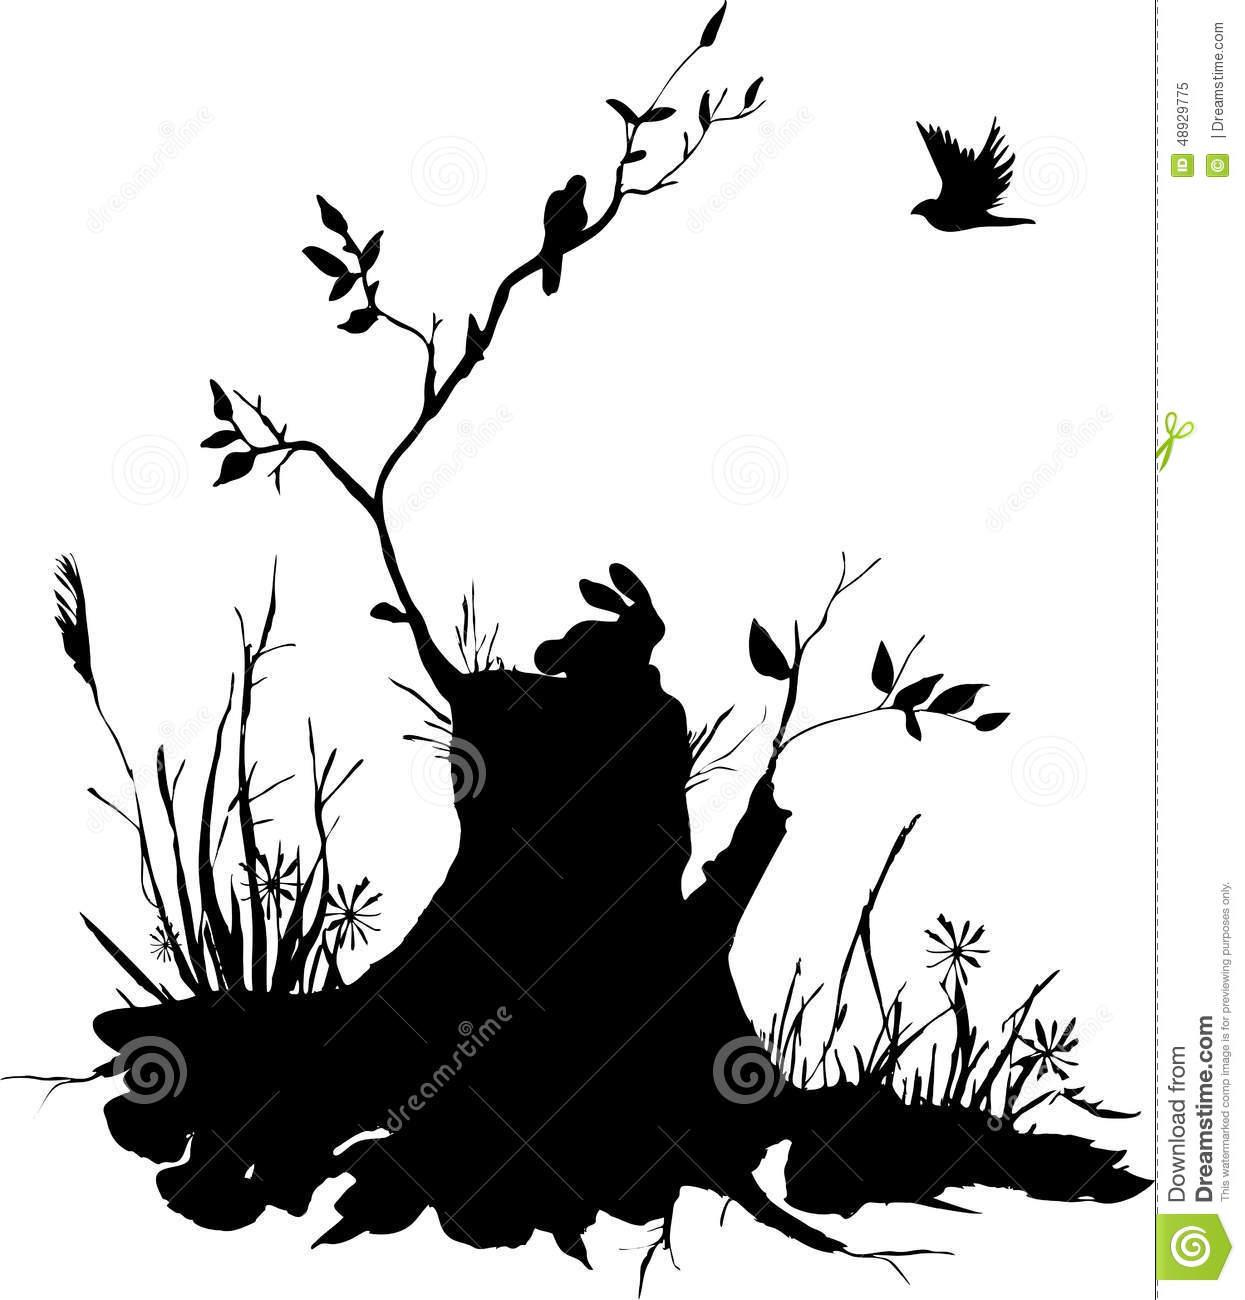 1245x1300 Tree Stump Silhouette Tree Stump Silhouette 5236 Interpixel